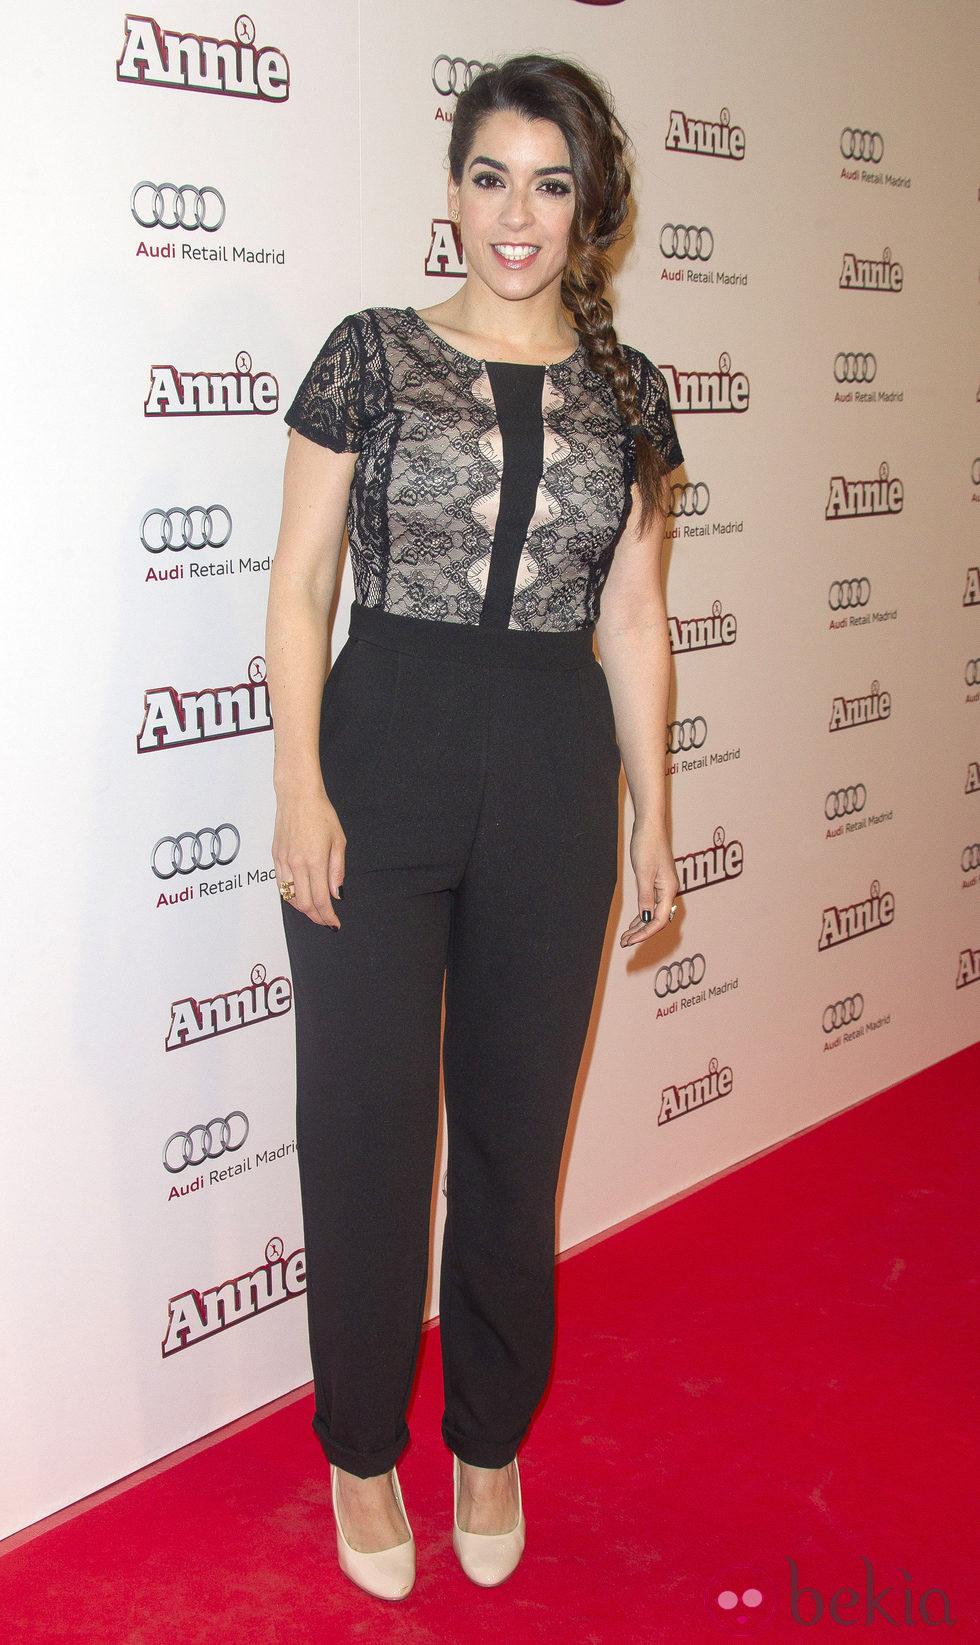 Ruth Lorenzo en la premiere de 'Annie' en Madrid